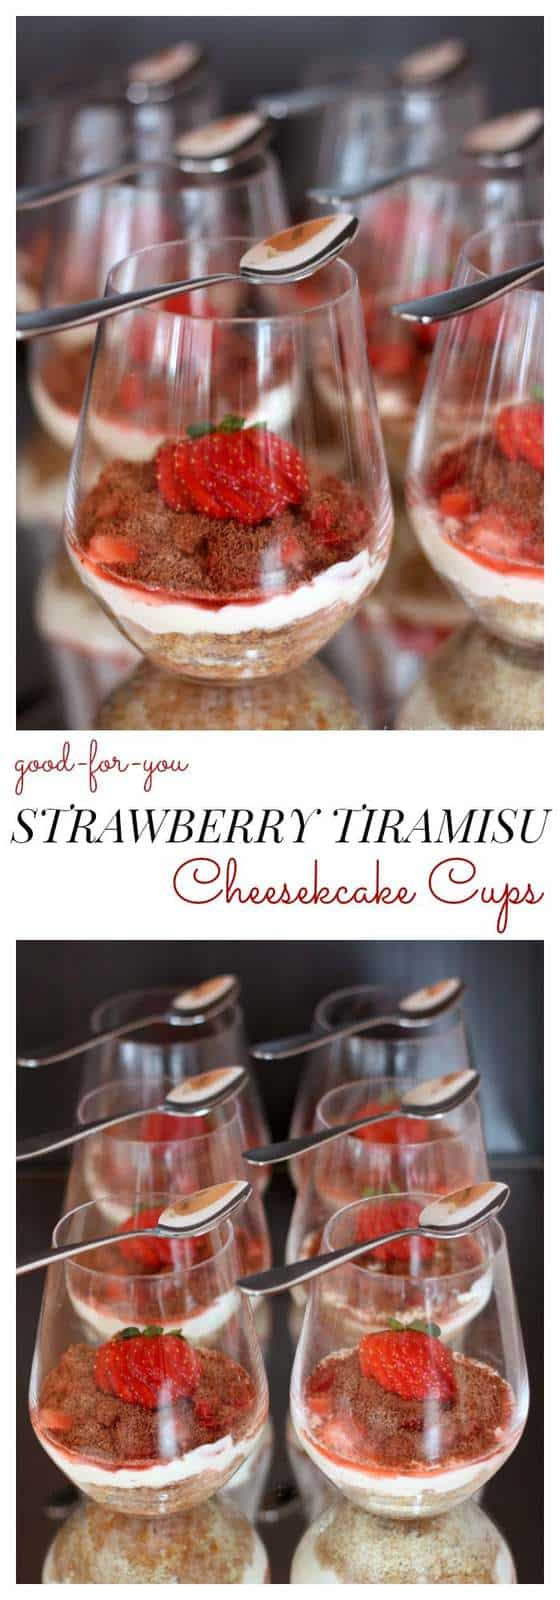 No-Bake Strawberry Tiramisu Cheesecake Cups - a healthy dessert tastes indulgent. Grain free, gluten free, and make with Greek yogurt! | cupcakesandkalechips.com